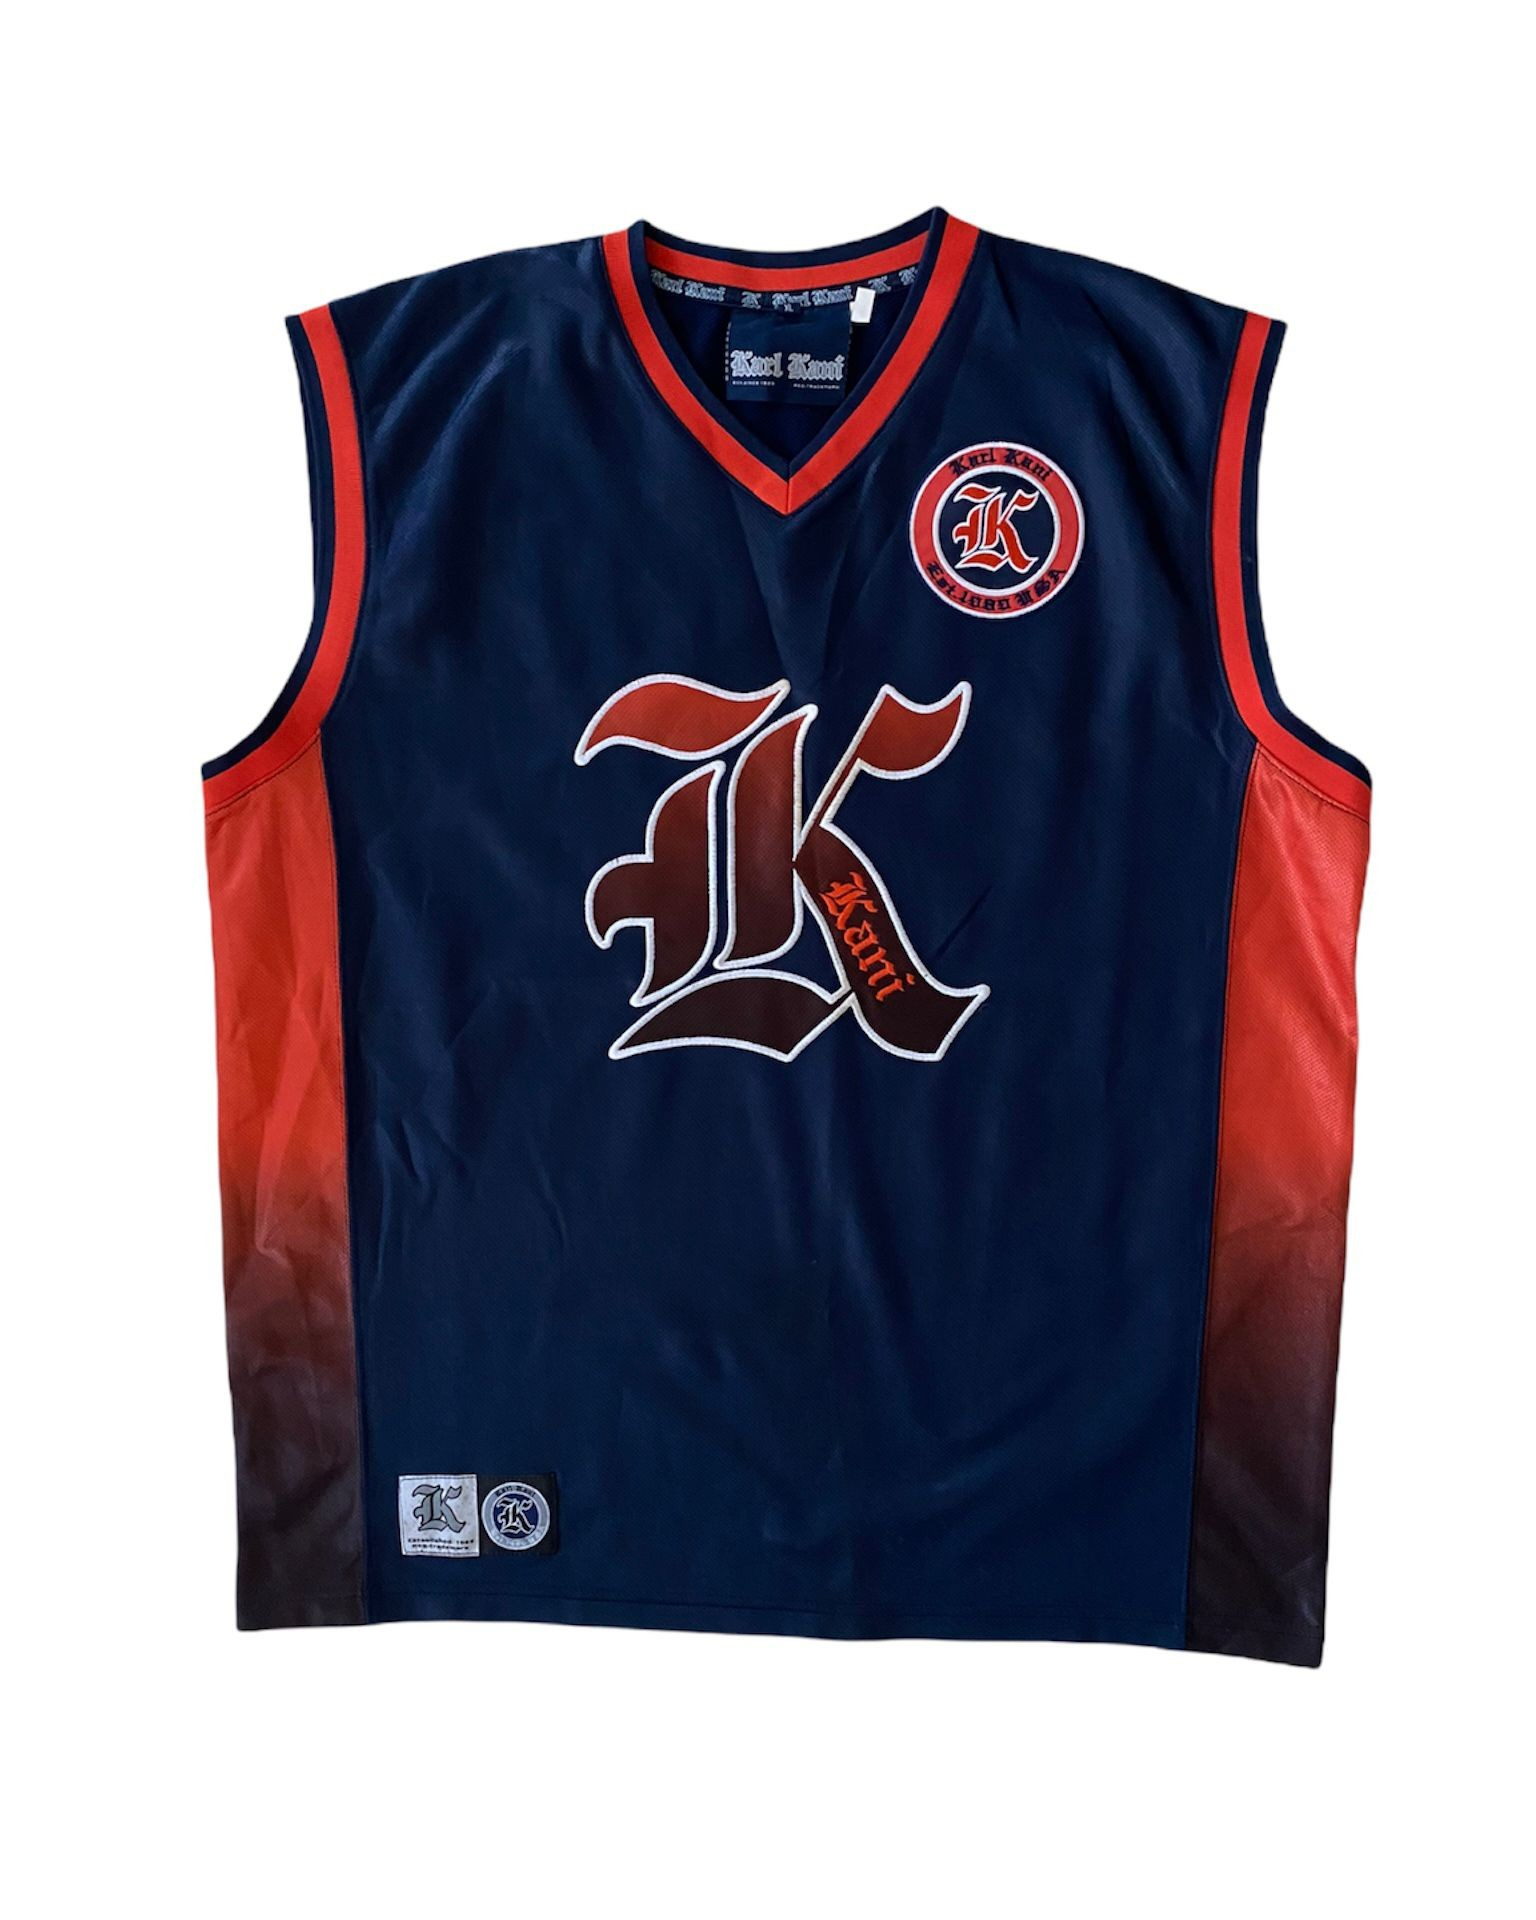 Karl Kani 90's Vintage Jersey (XL)